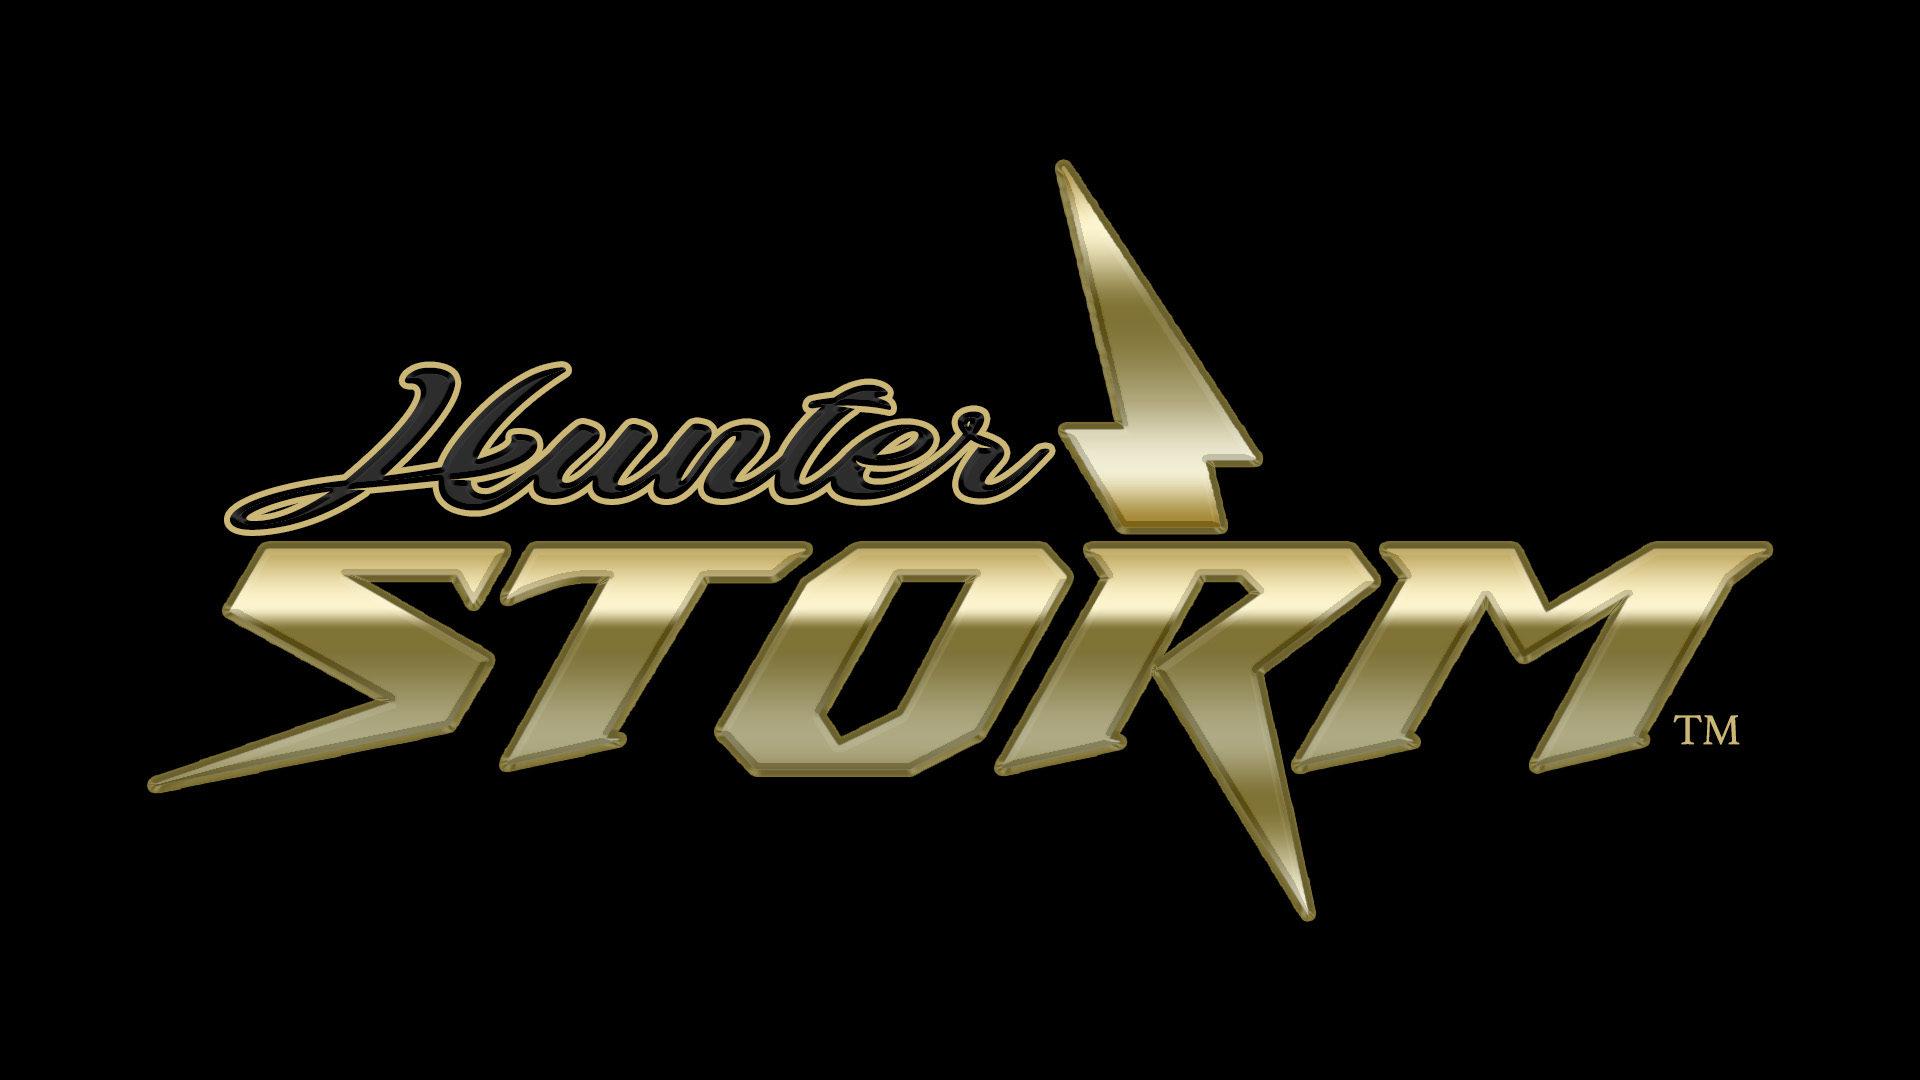 Hunter Storm ™